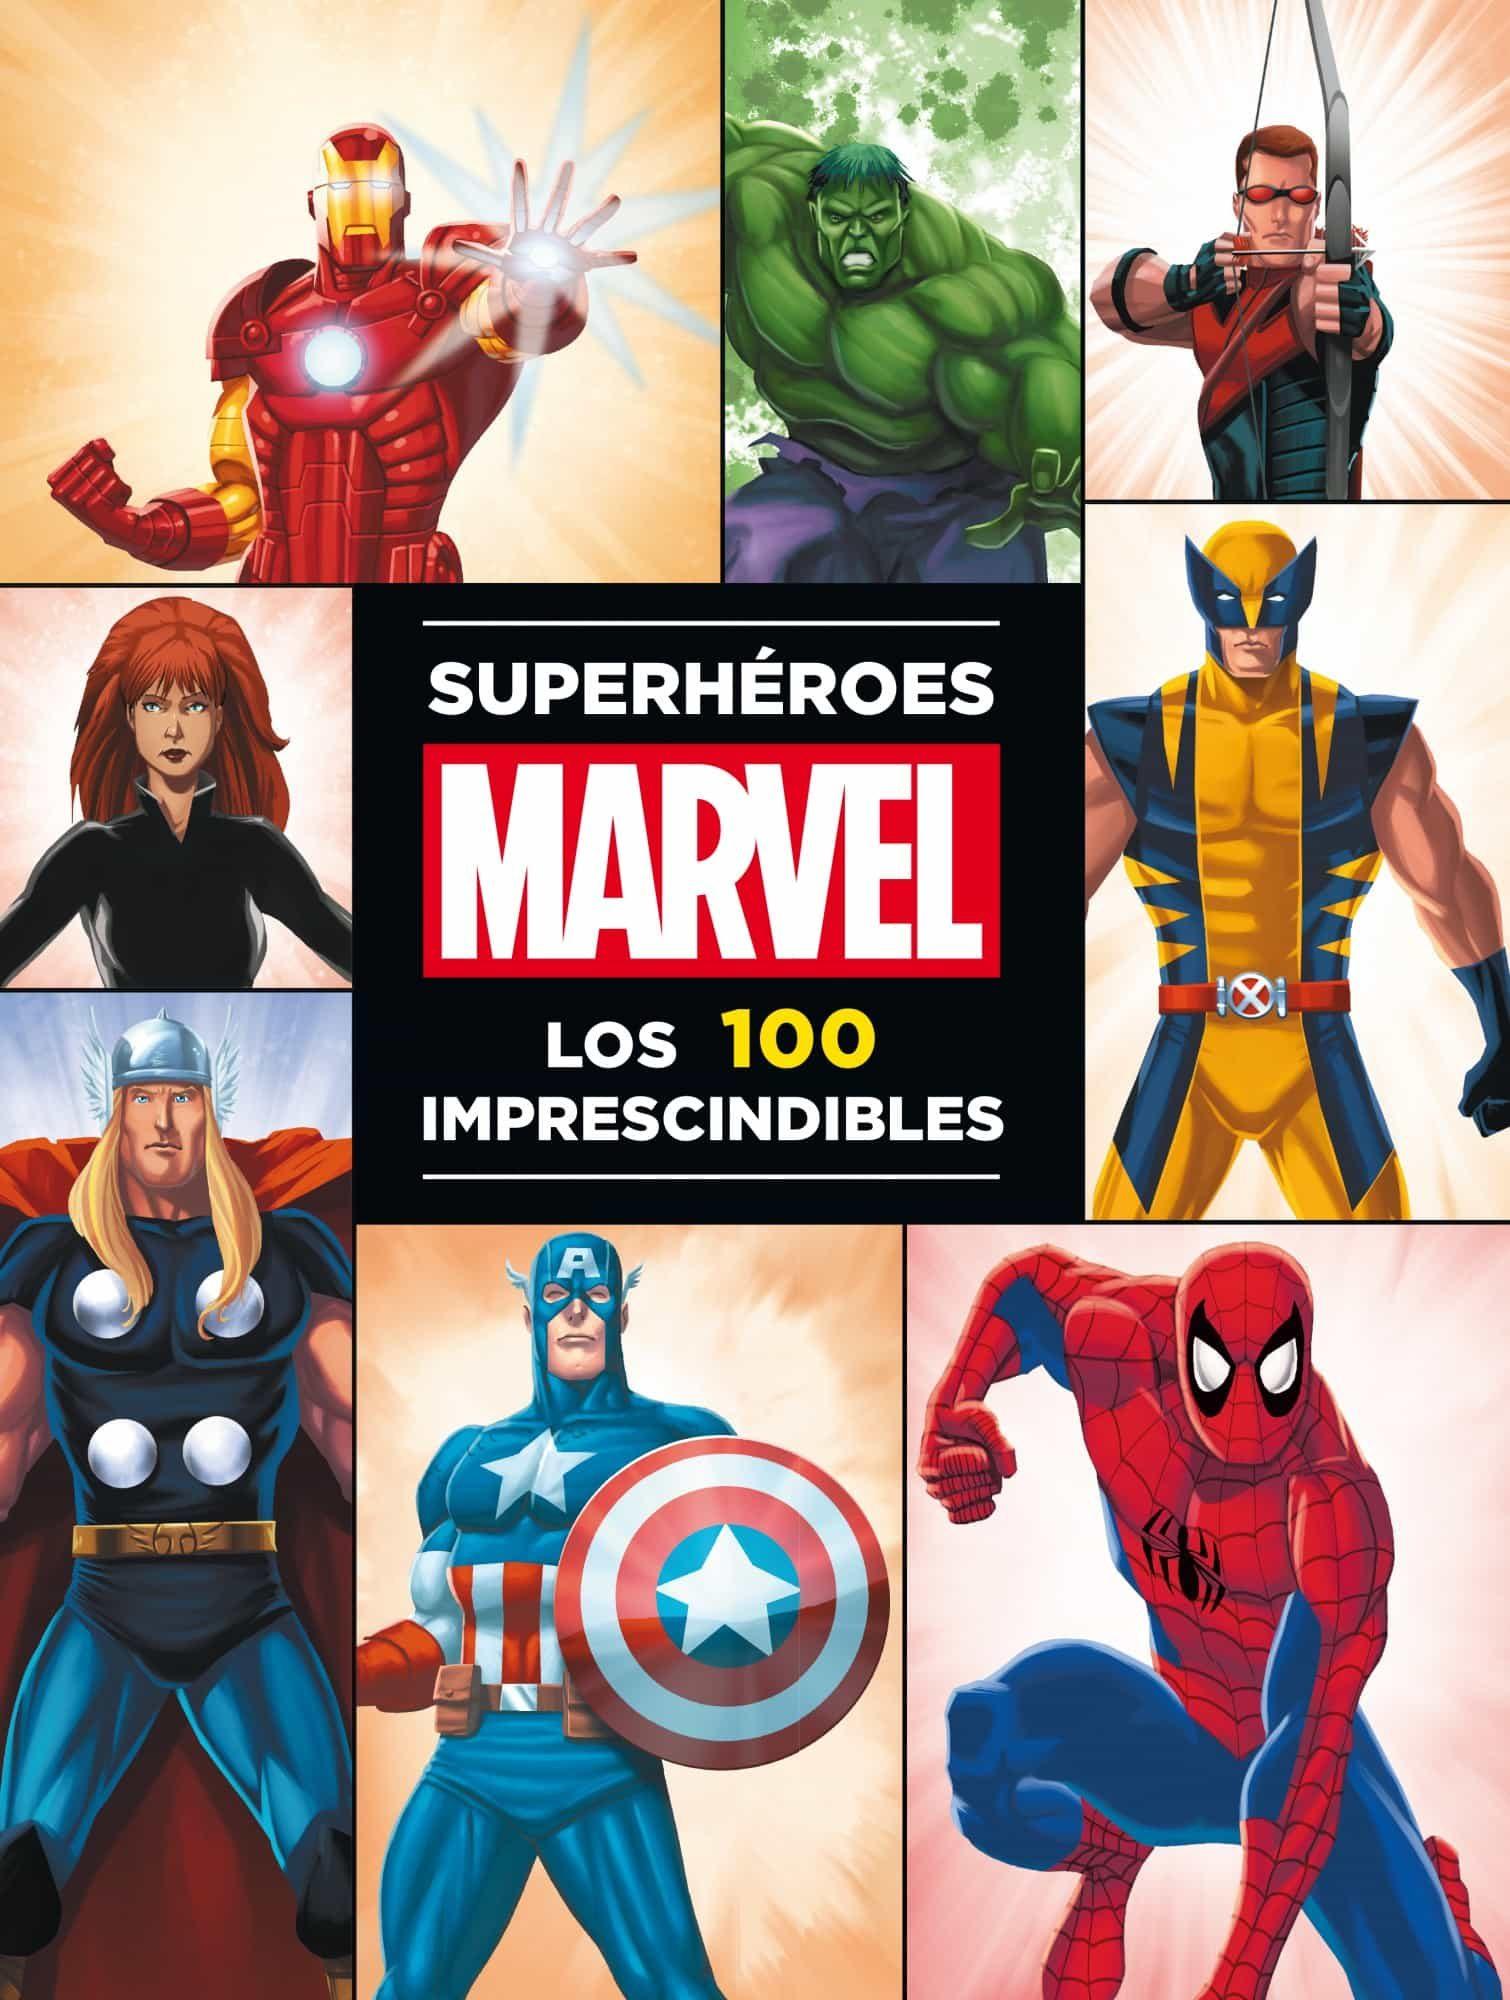 superheroes marvel los 100 imprescindibles vv aa comprar libro 9788415343561. Black Bedroom Furniture Sets. Home Design Ideas